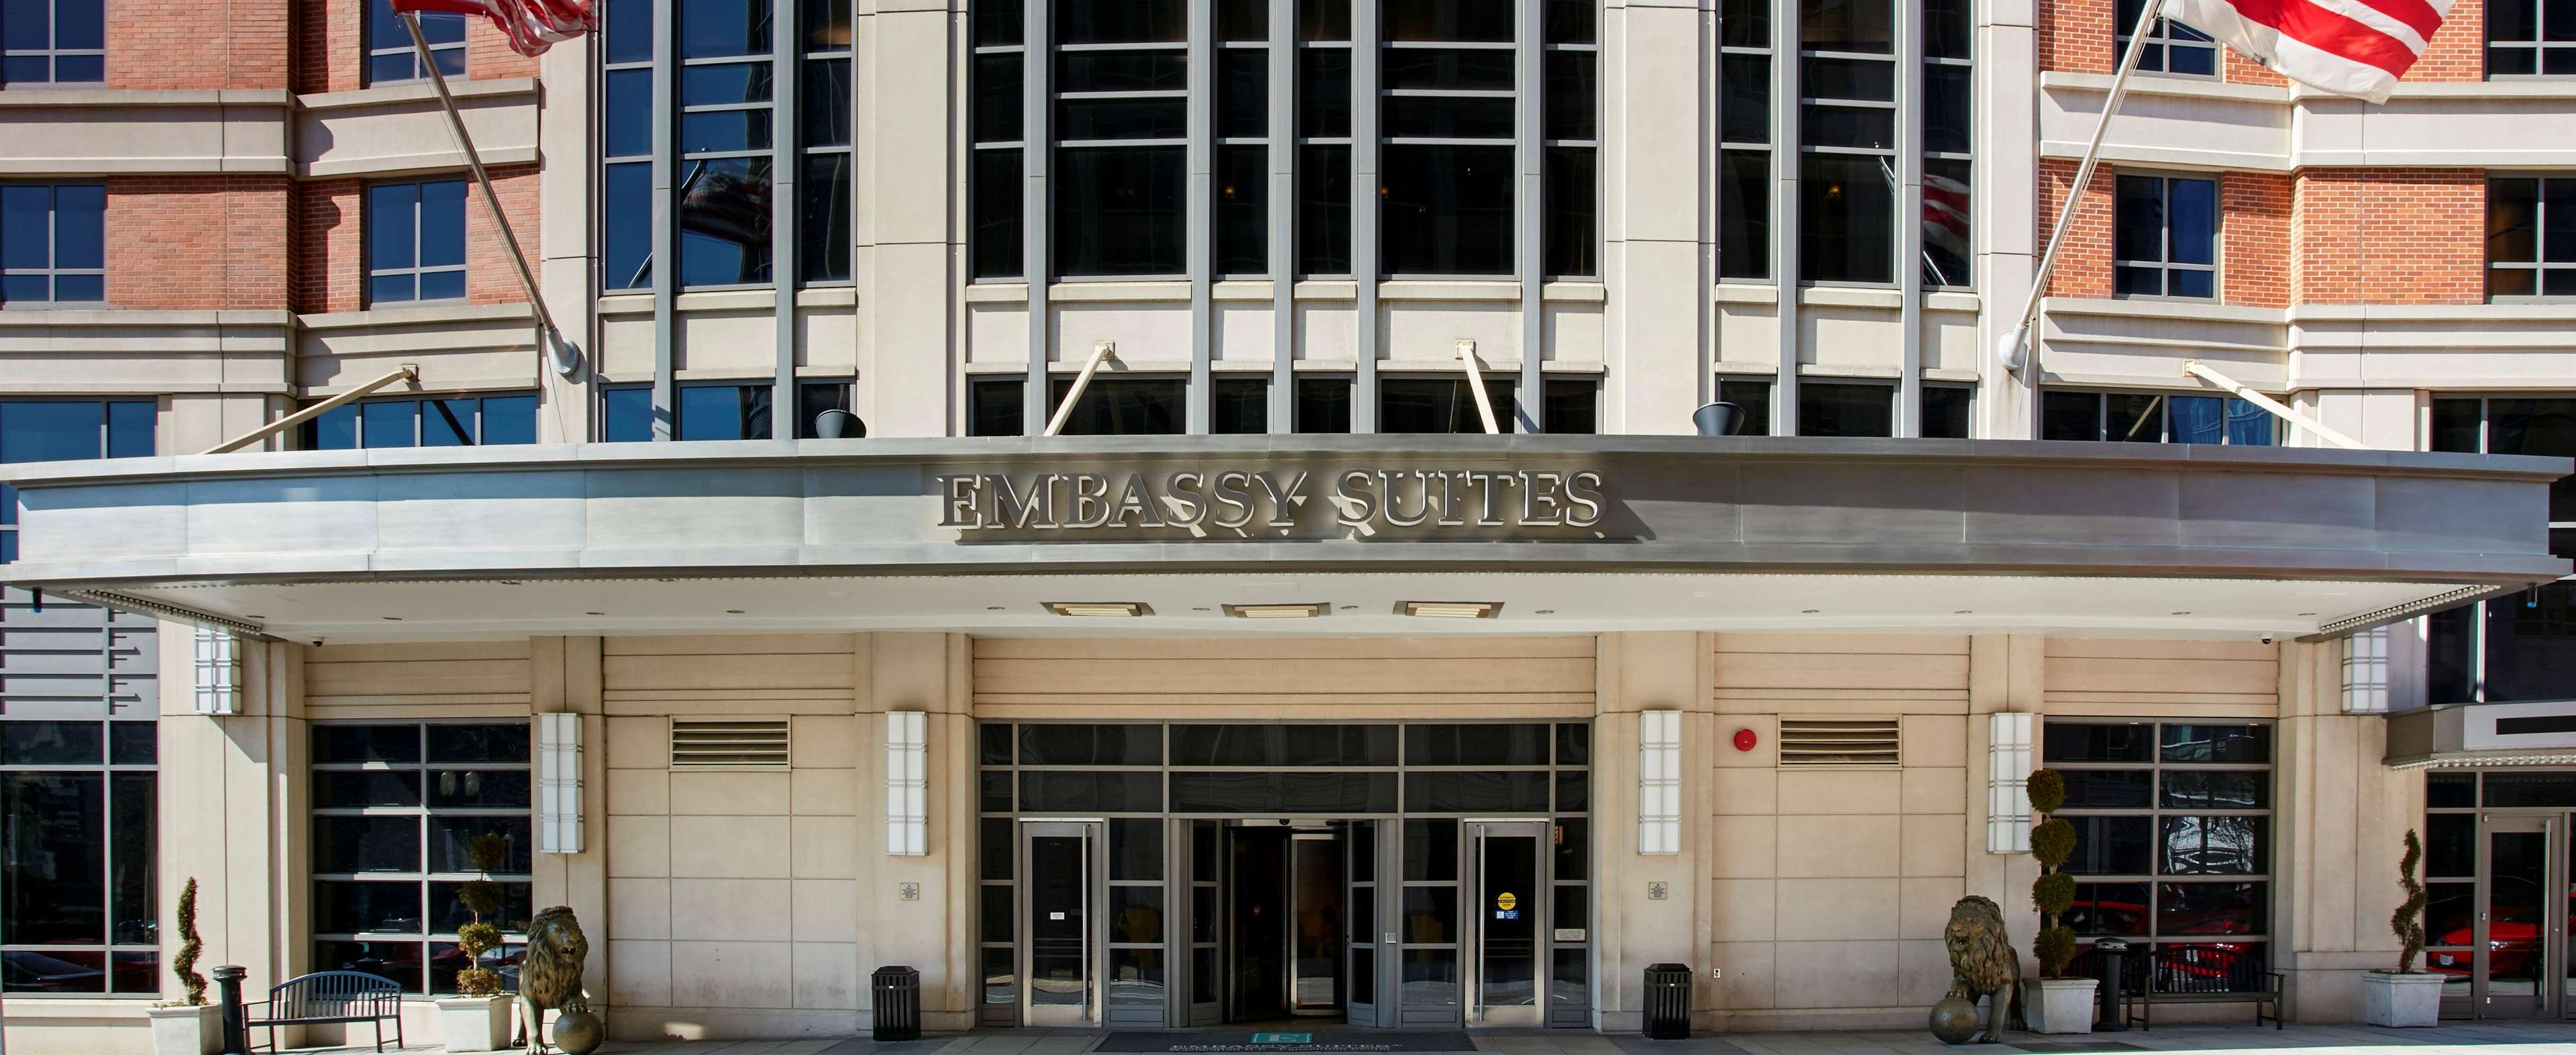 Embassy Suites by Hilton Washington DC Convention Center image 0